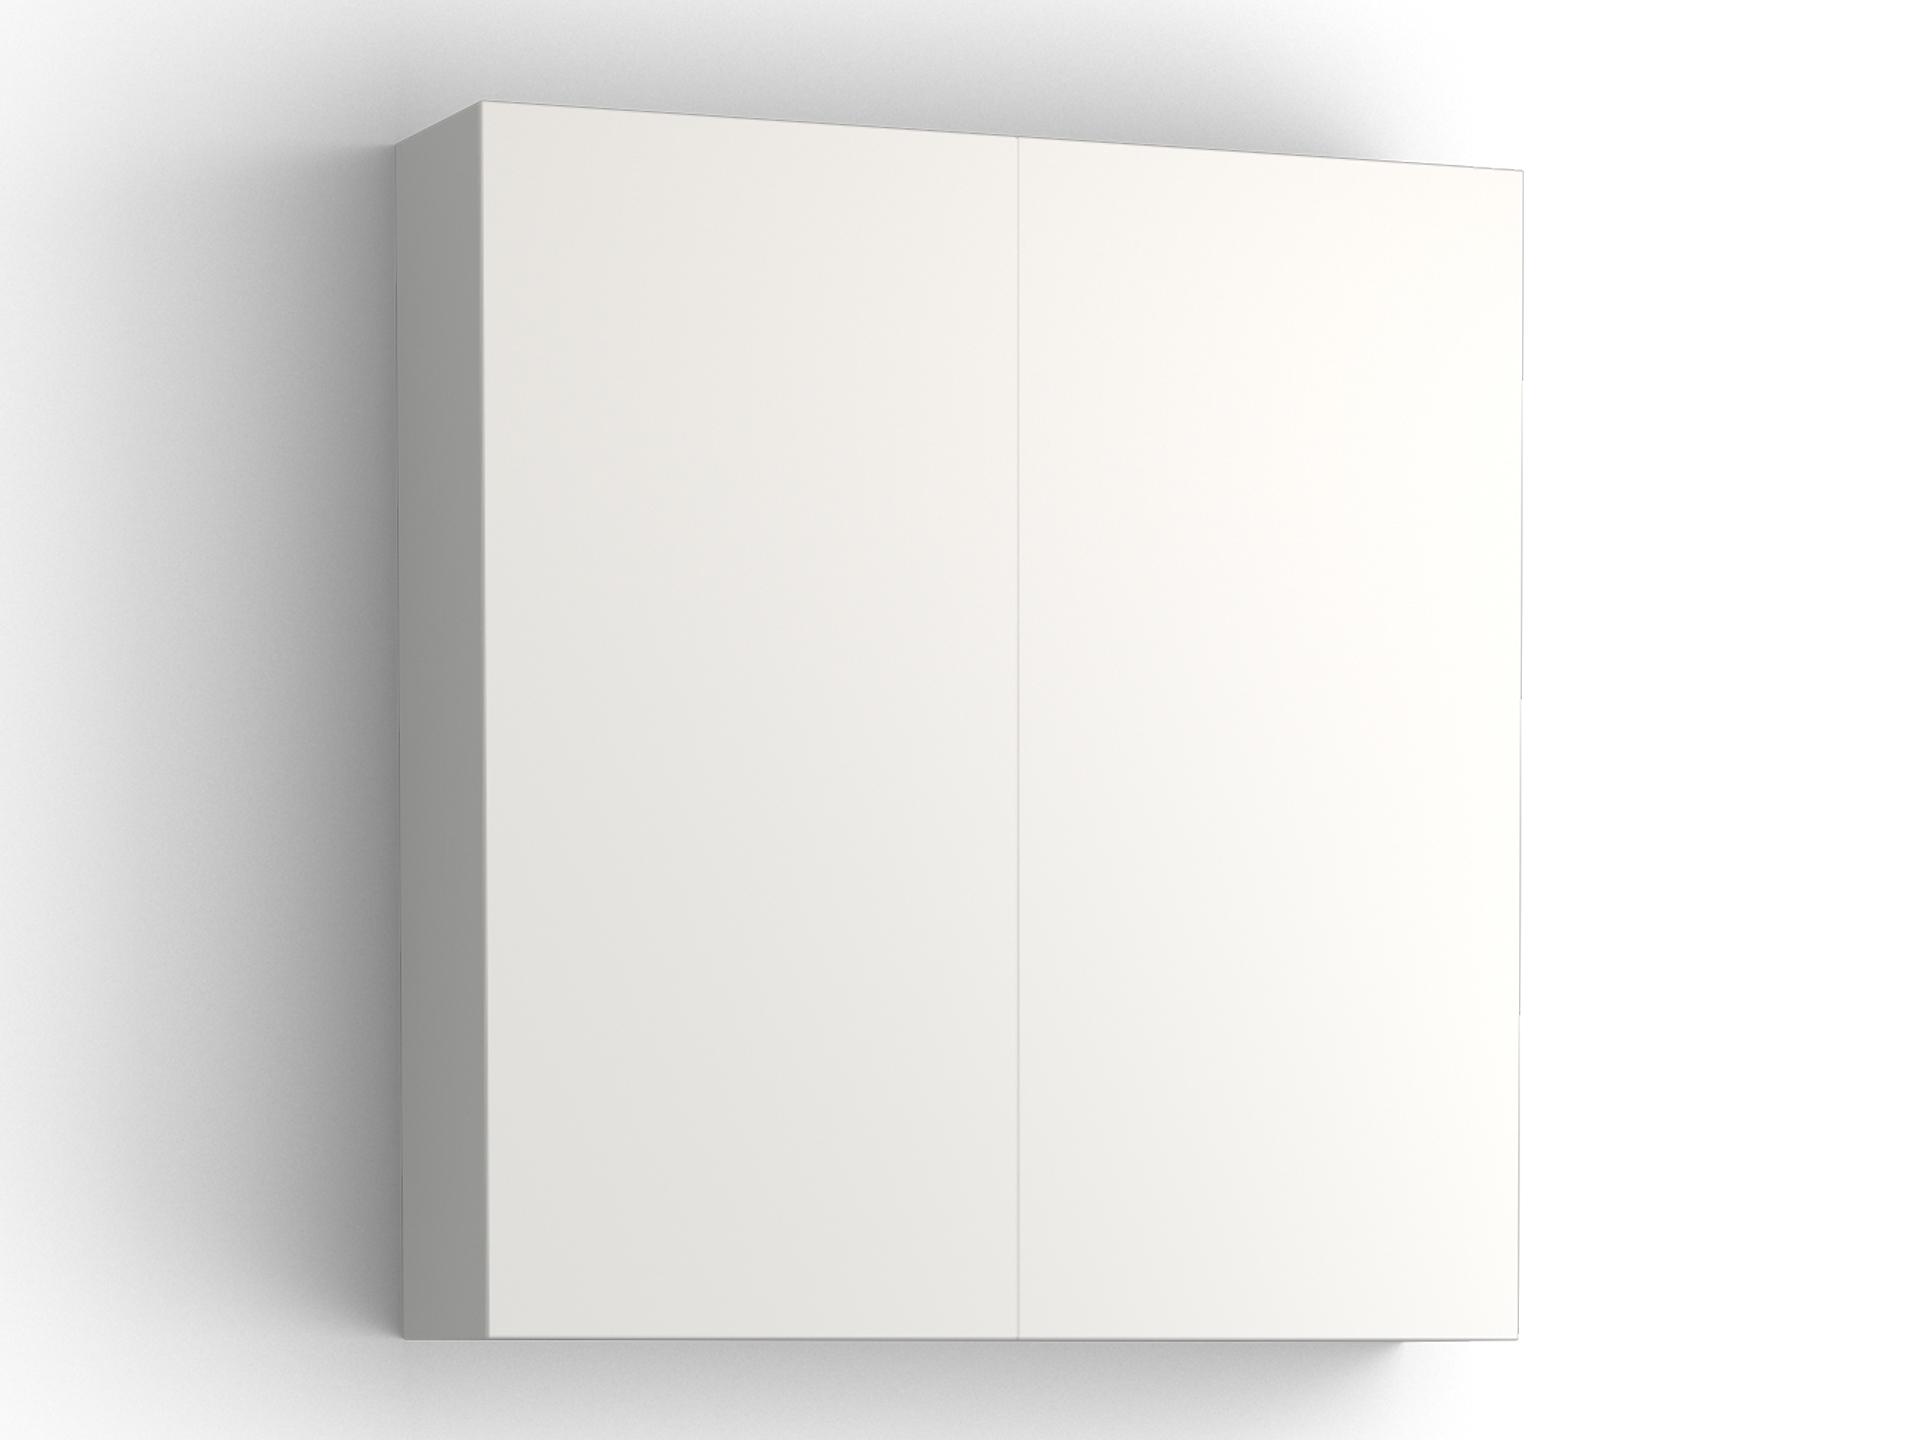 Spegelskåp Vedum Basic 60cm Vit